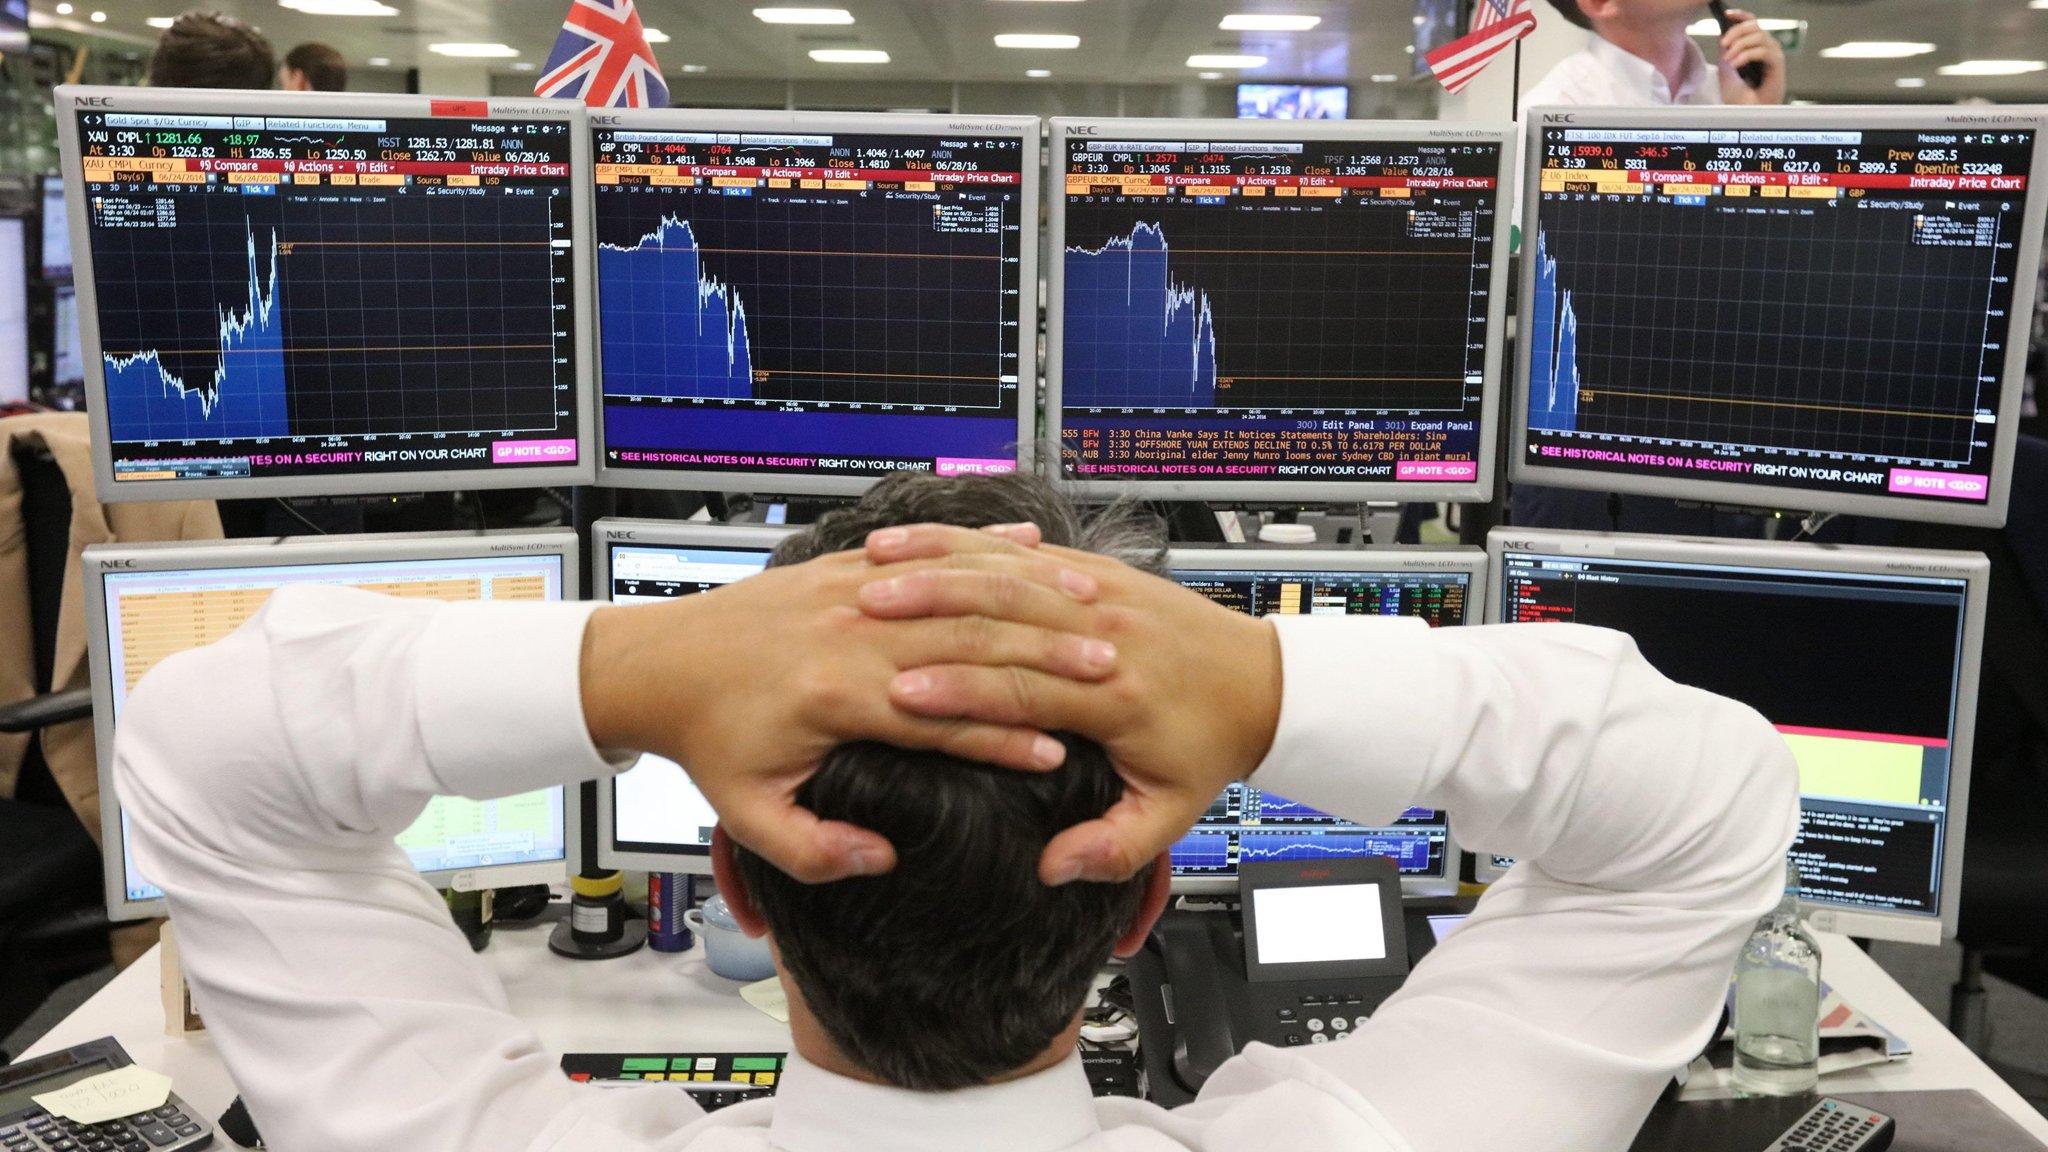 Little-known trading strategy exacerbates market turmoil | Financial